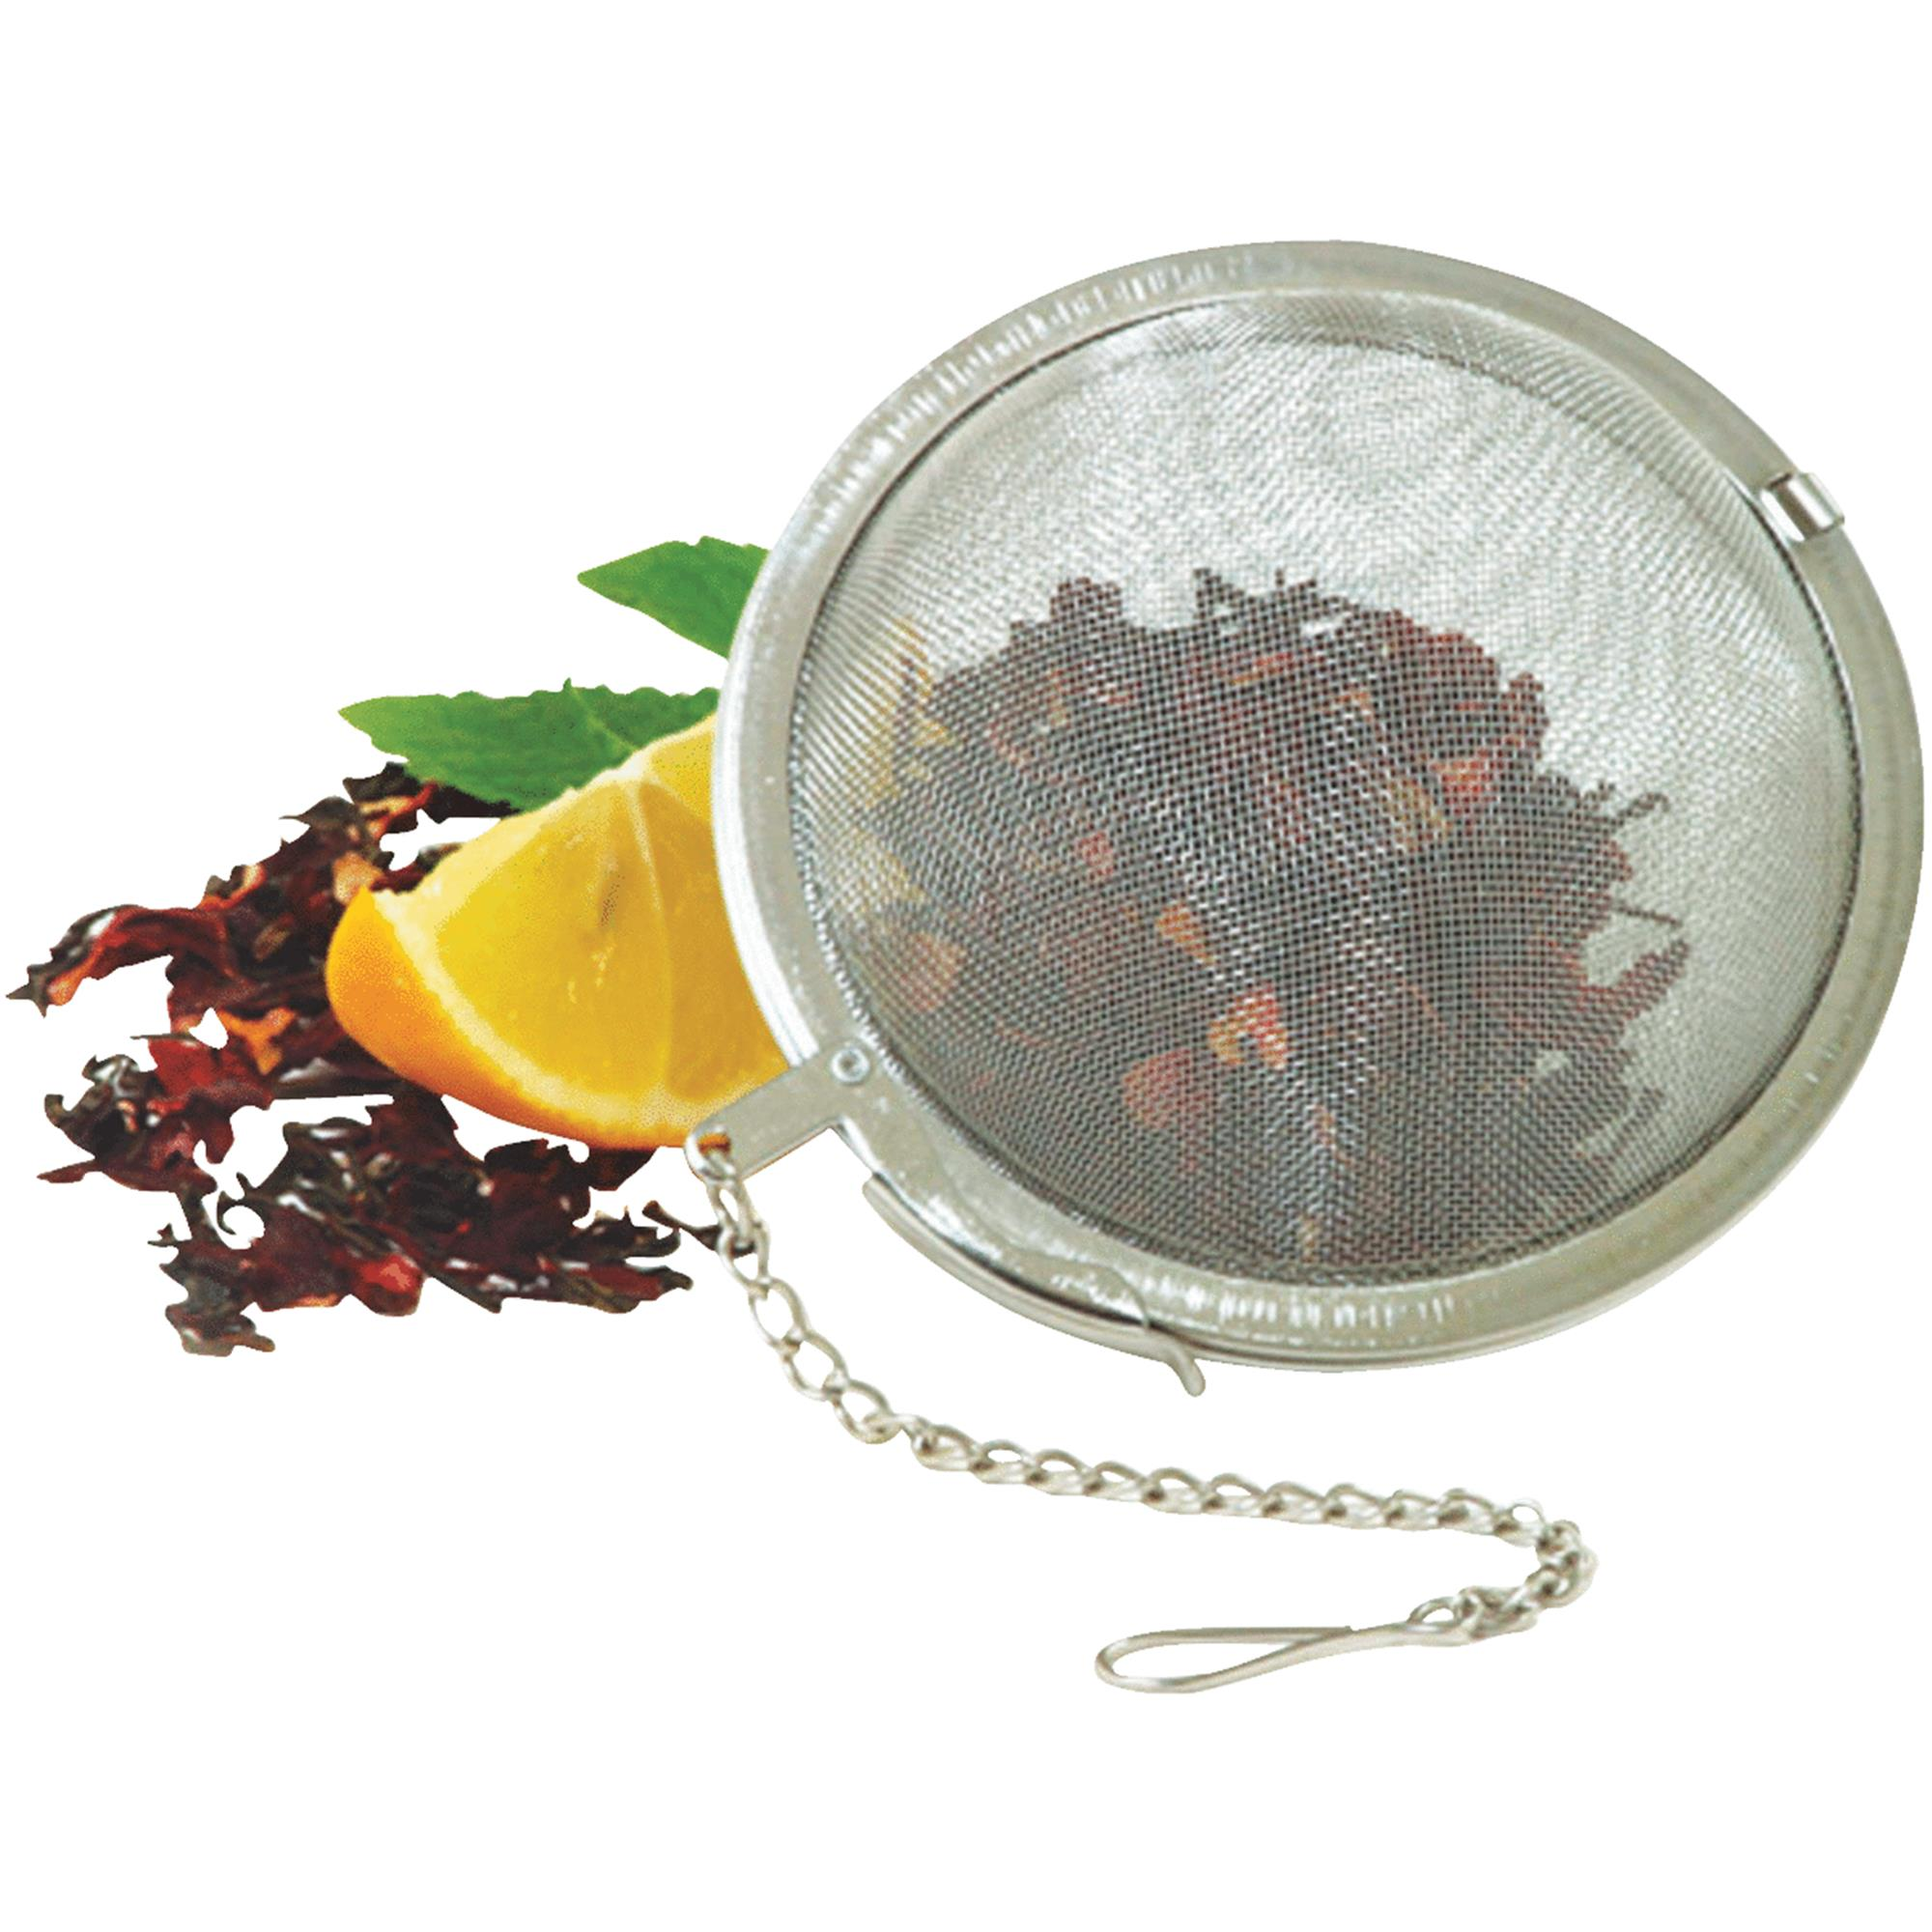 Norpro Mesh Tea Ball